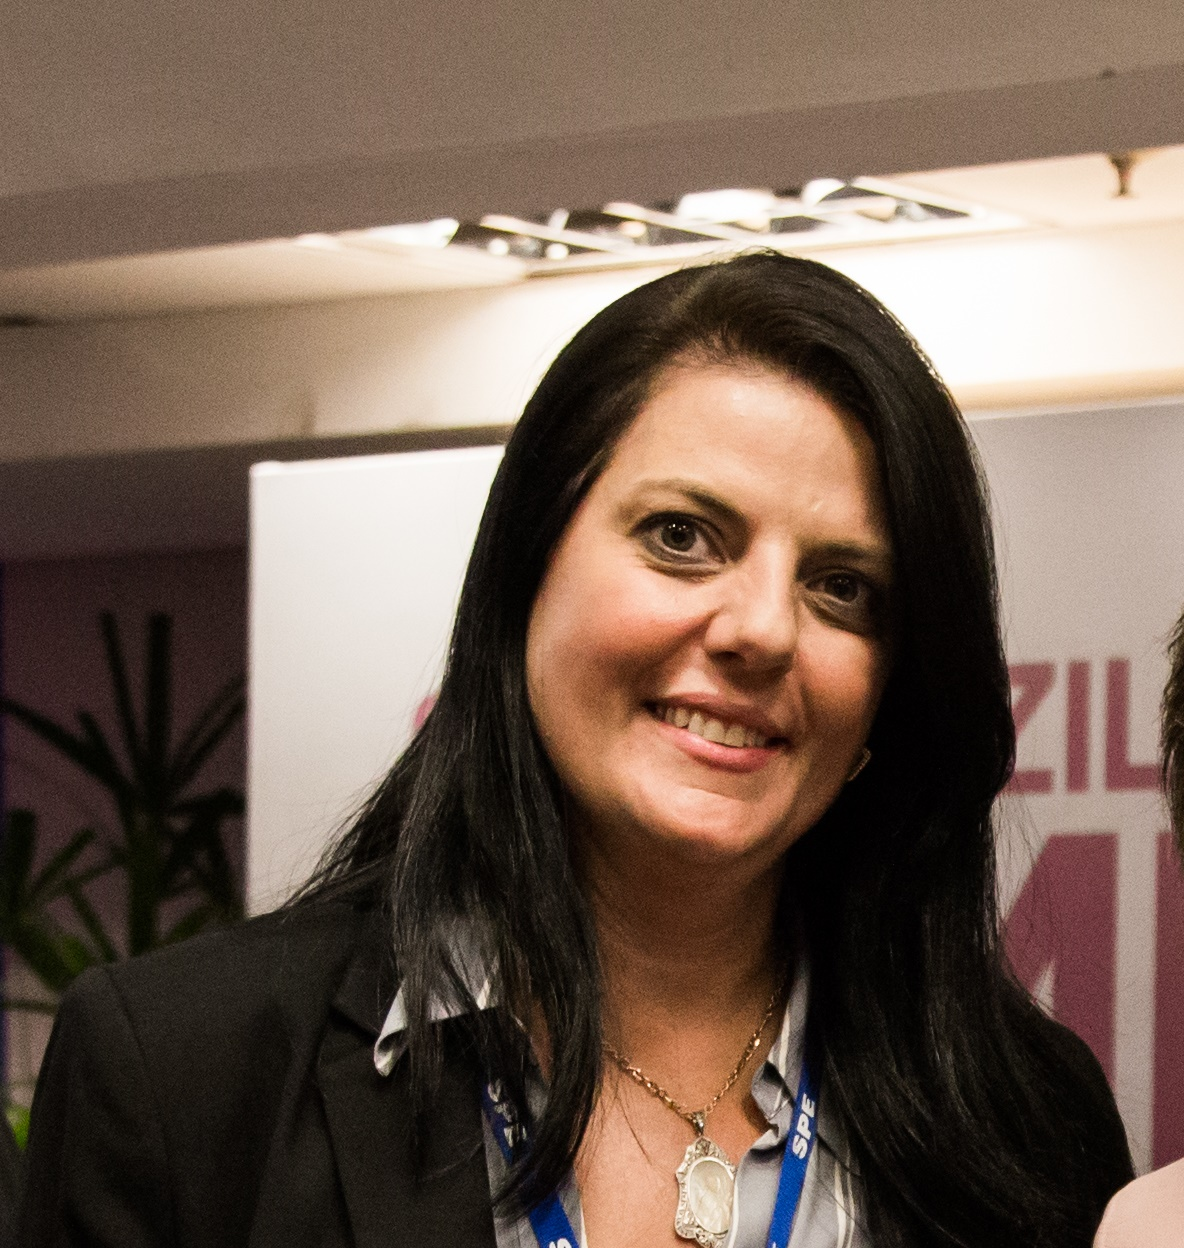 Anna Paula Lougon Duarte